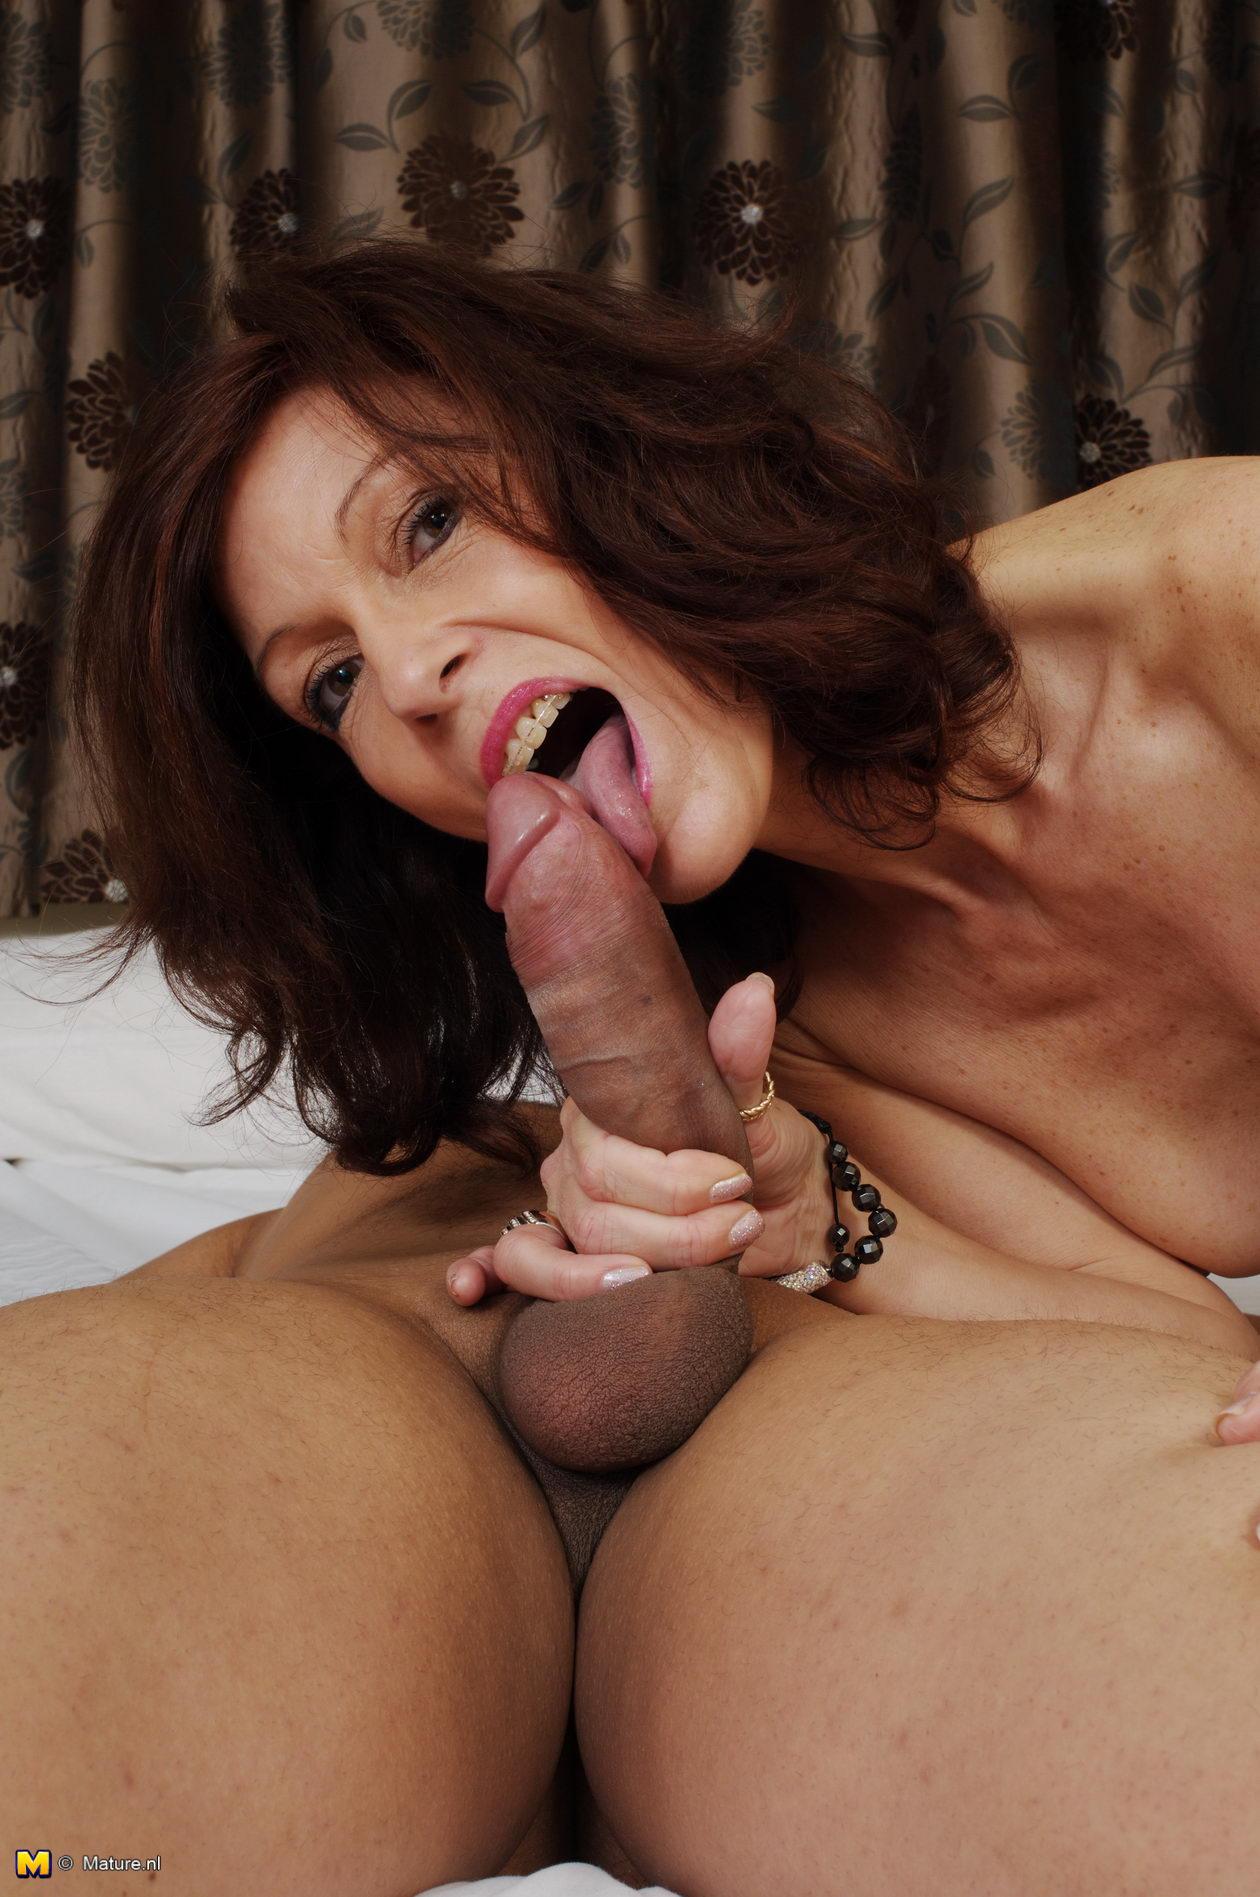 Horny milf sucking dick